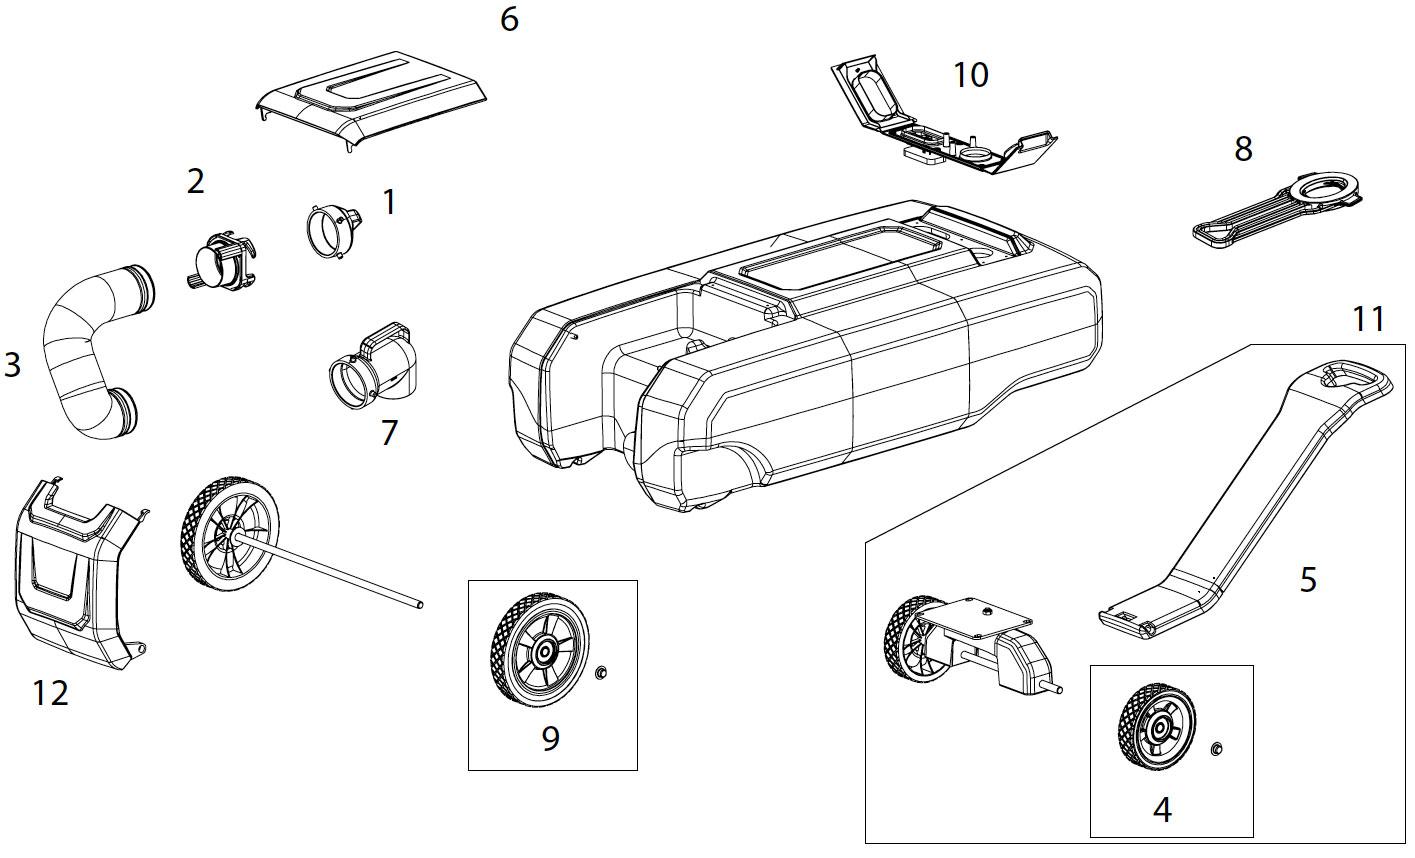 Septic Tank Wiring Diagram Septic Tank Installation